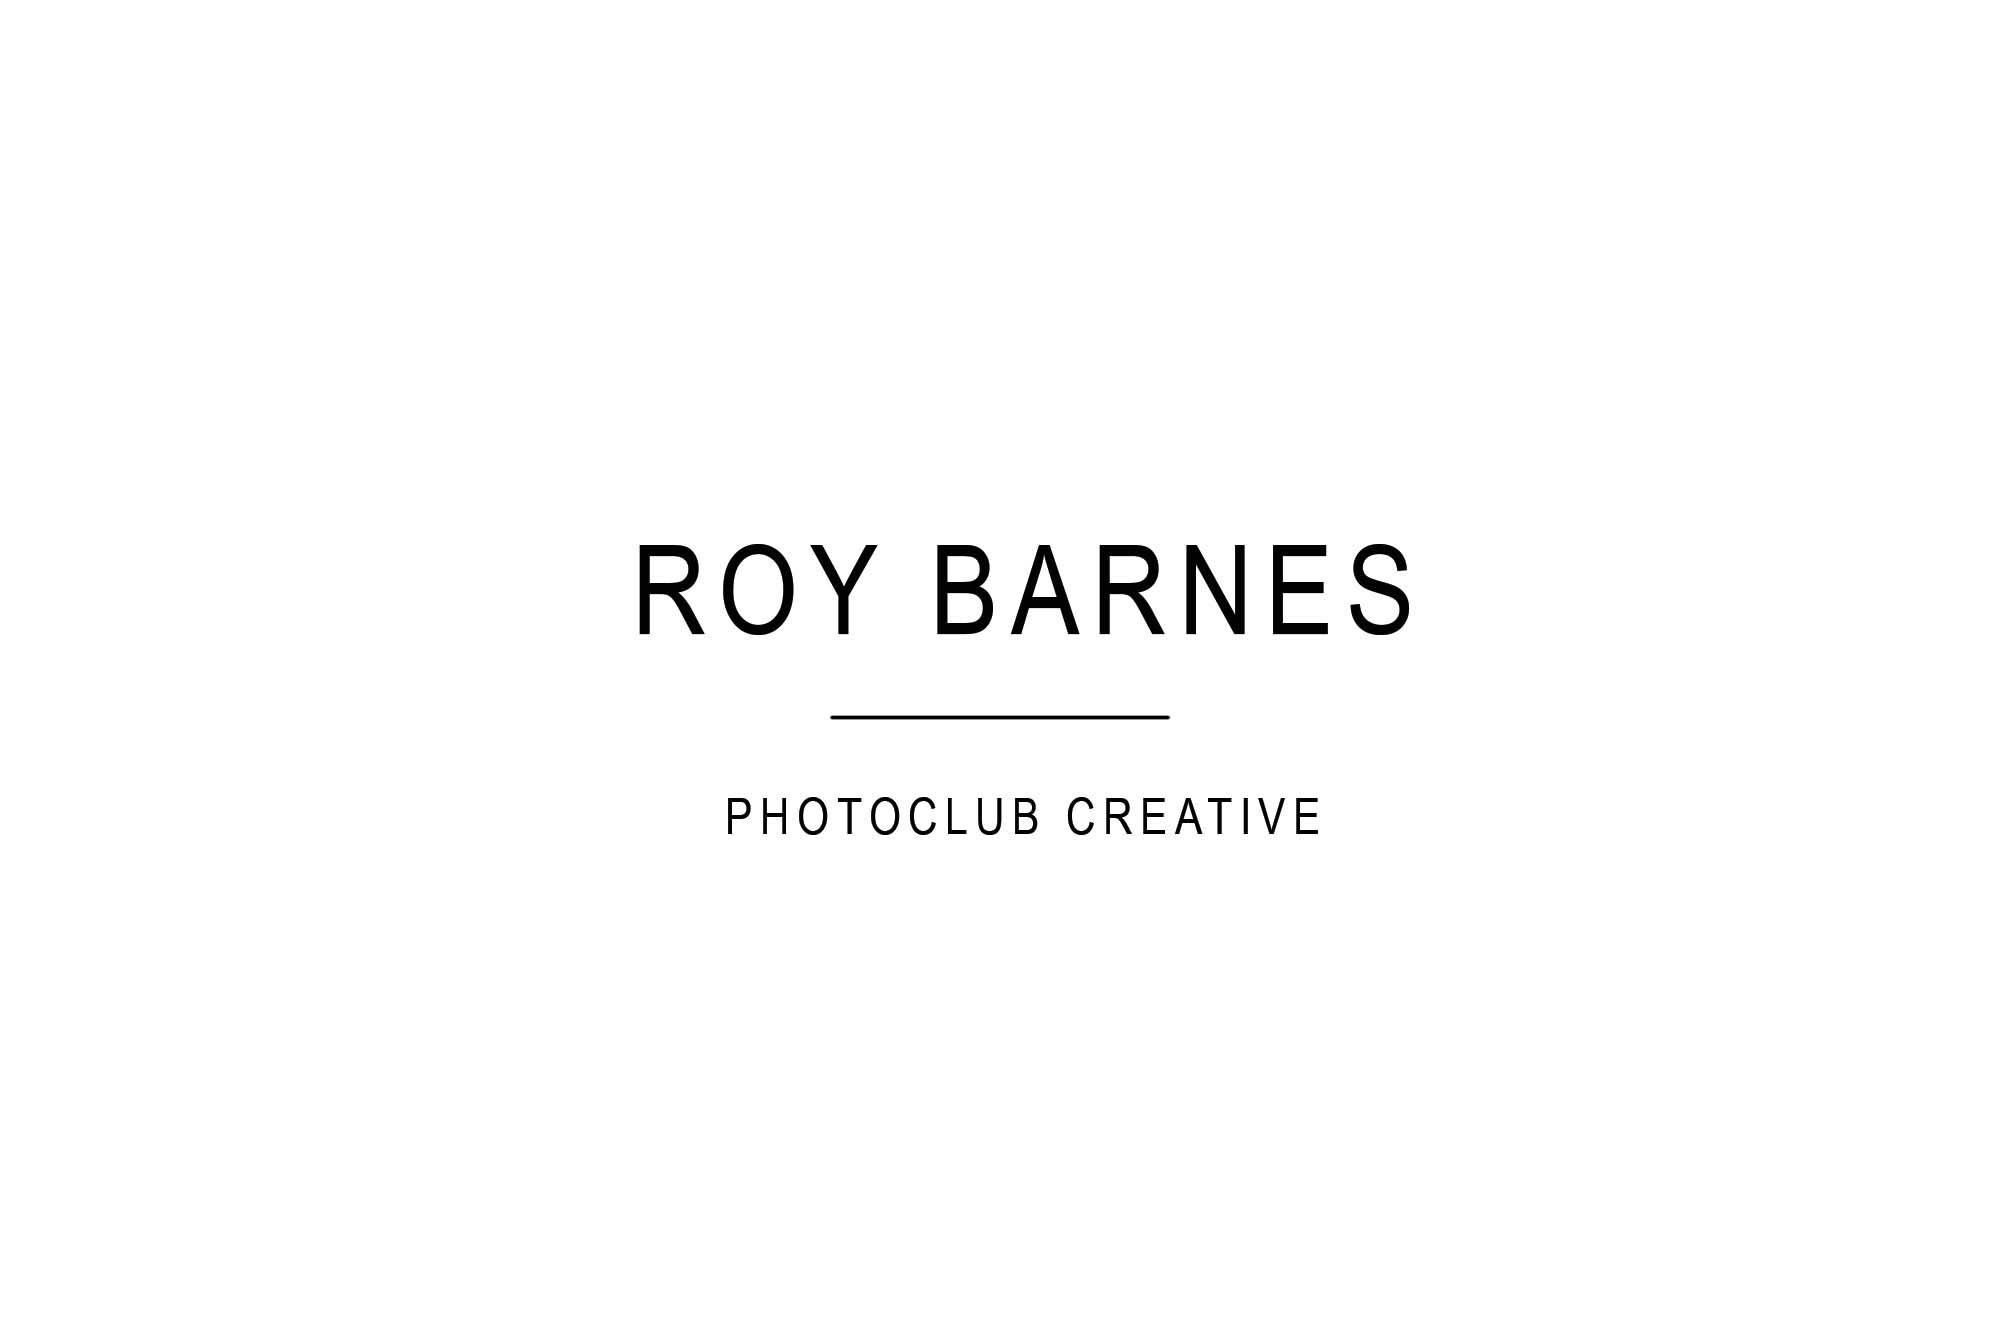 RoyBarnes_00_Title_WhtBg.jpg